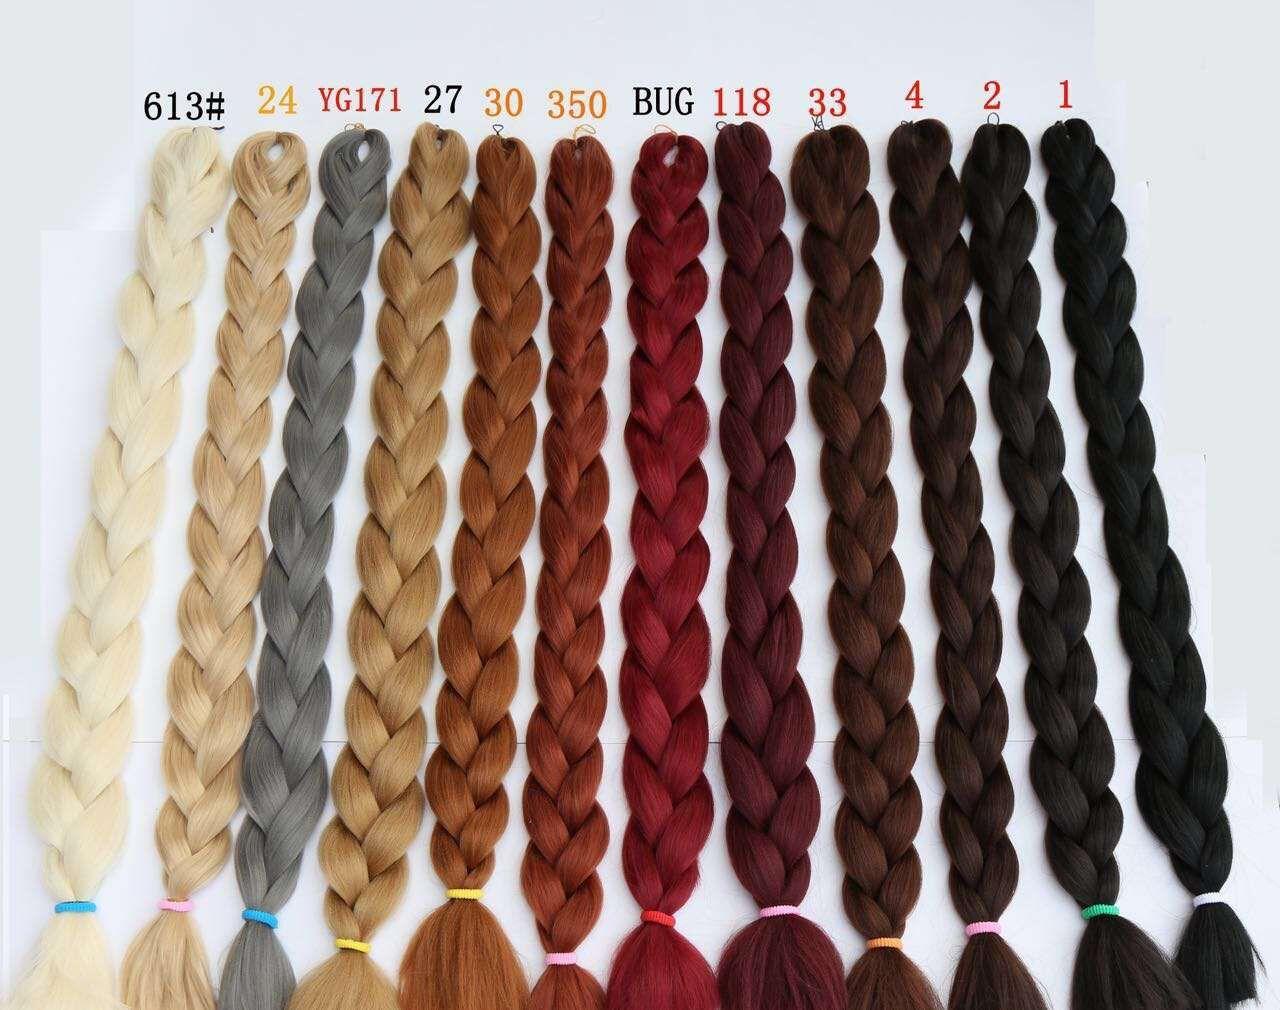 Ten kanekalon hair colors rituals you should know in 28 kanekalon hair x braid ultra volume 82inch 165g multi color mixed nvjuhfo Image collections